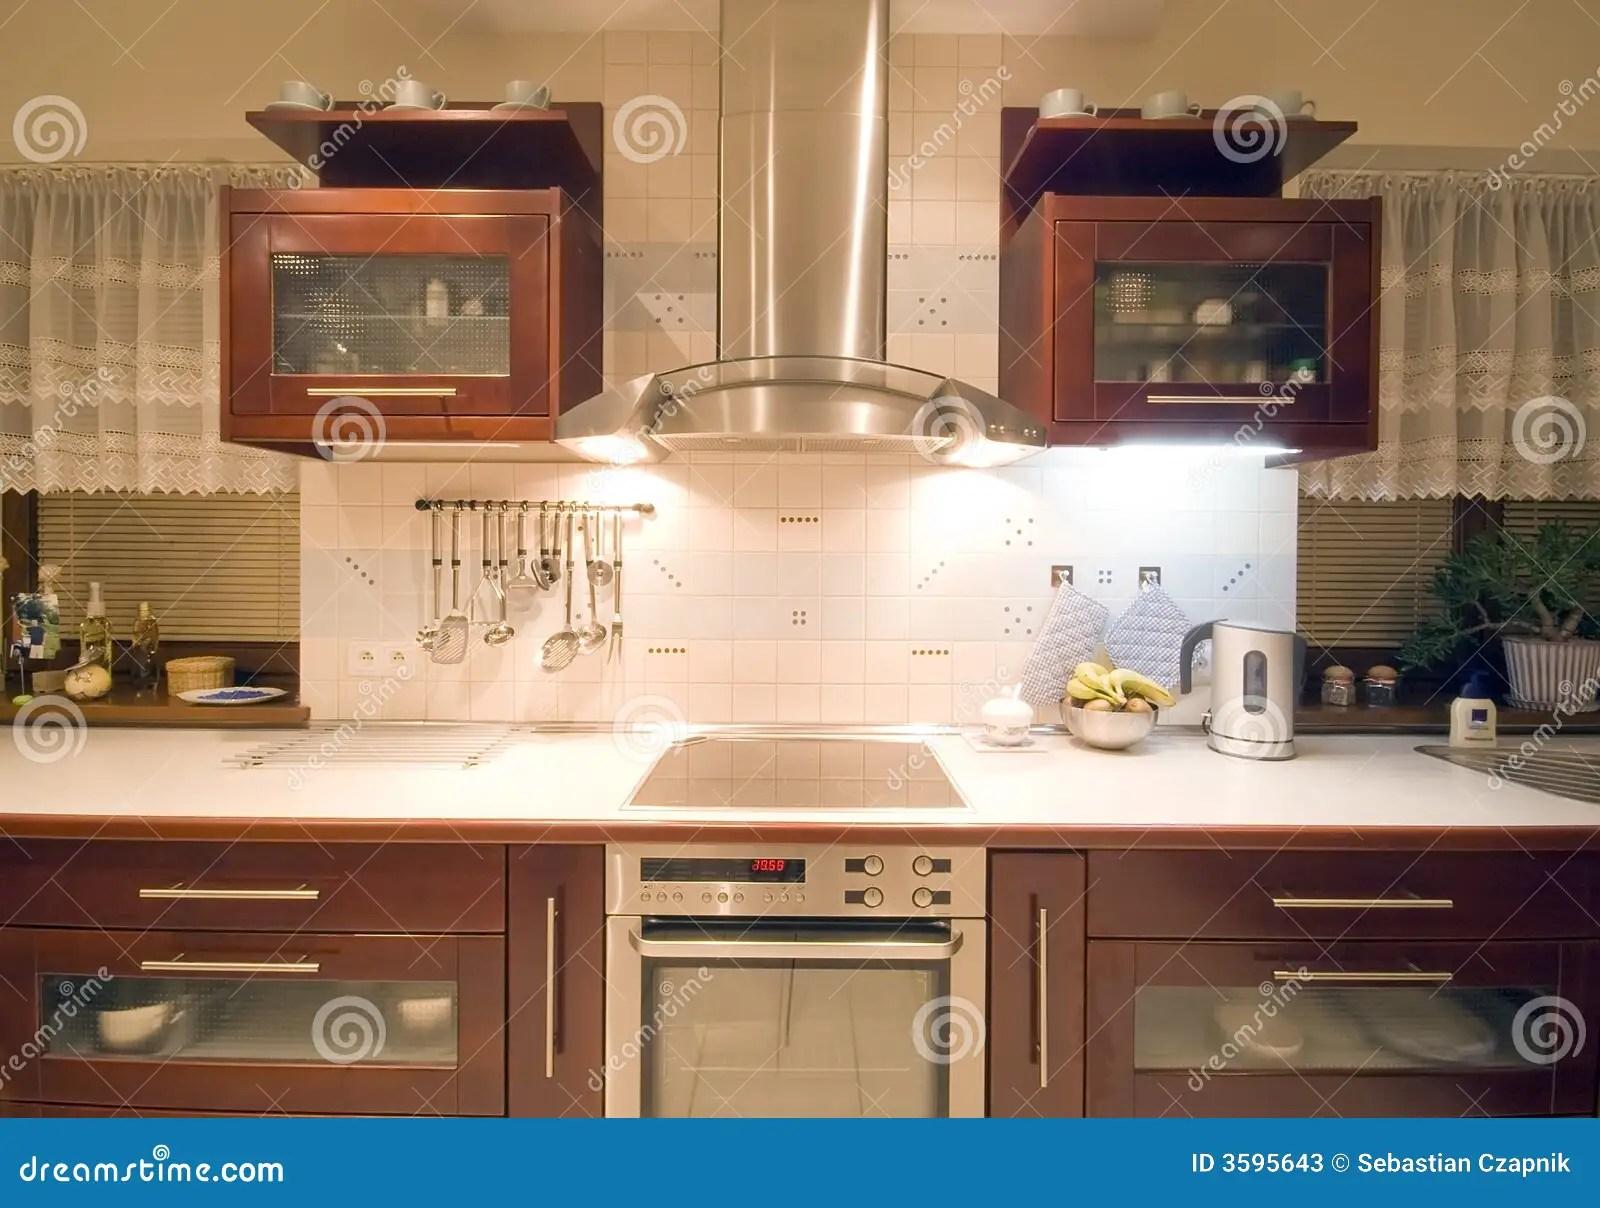 in stock kitchens kitchen settee 棕色内部厨房库存图片 图片包括有视窗 烤箱 碗柜 出票人 户内 经典 棕色内部厨房